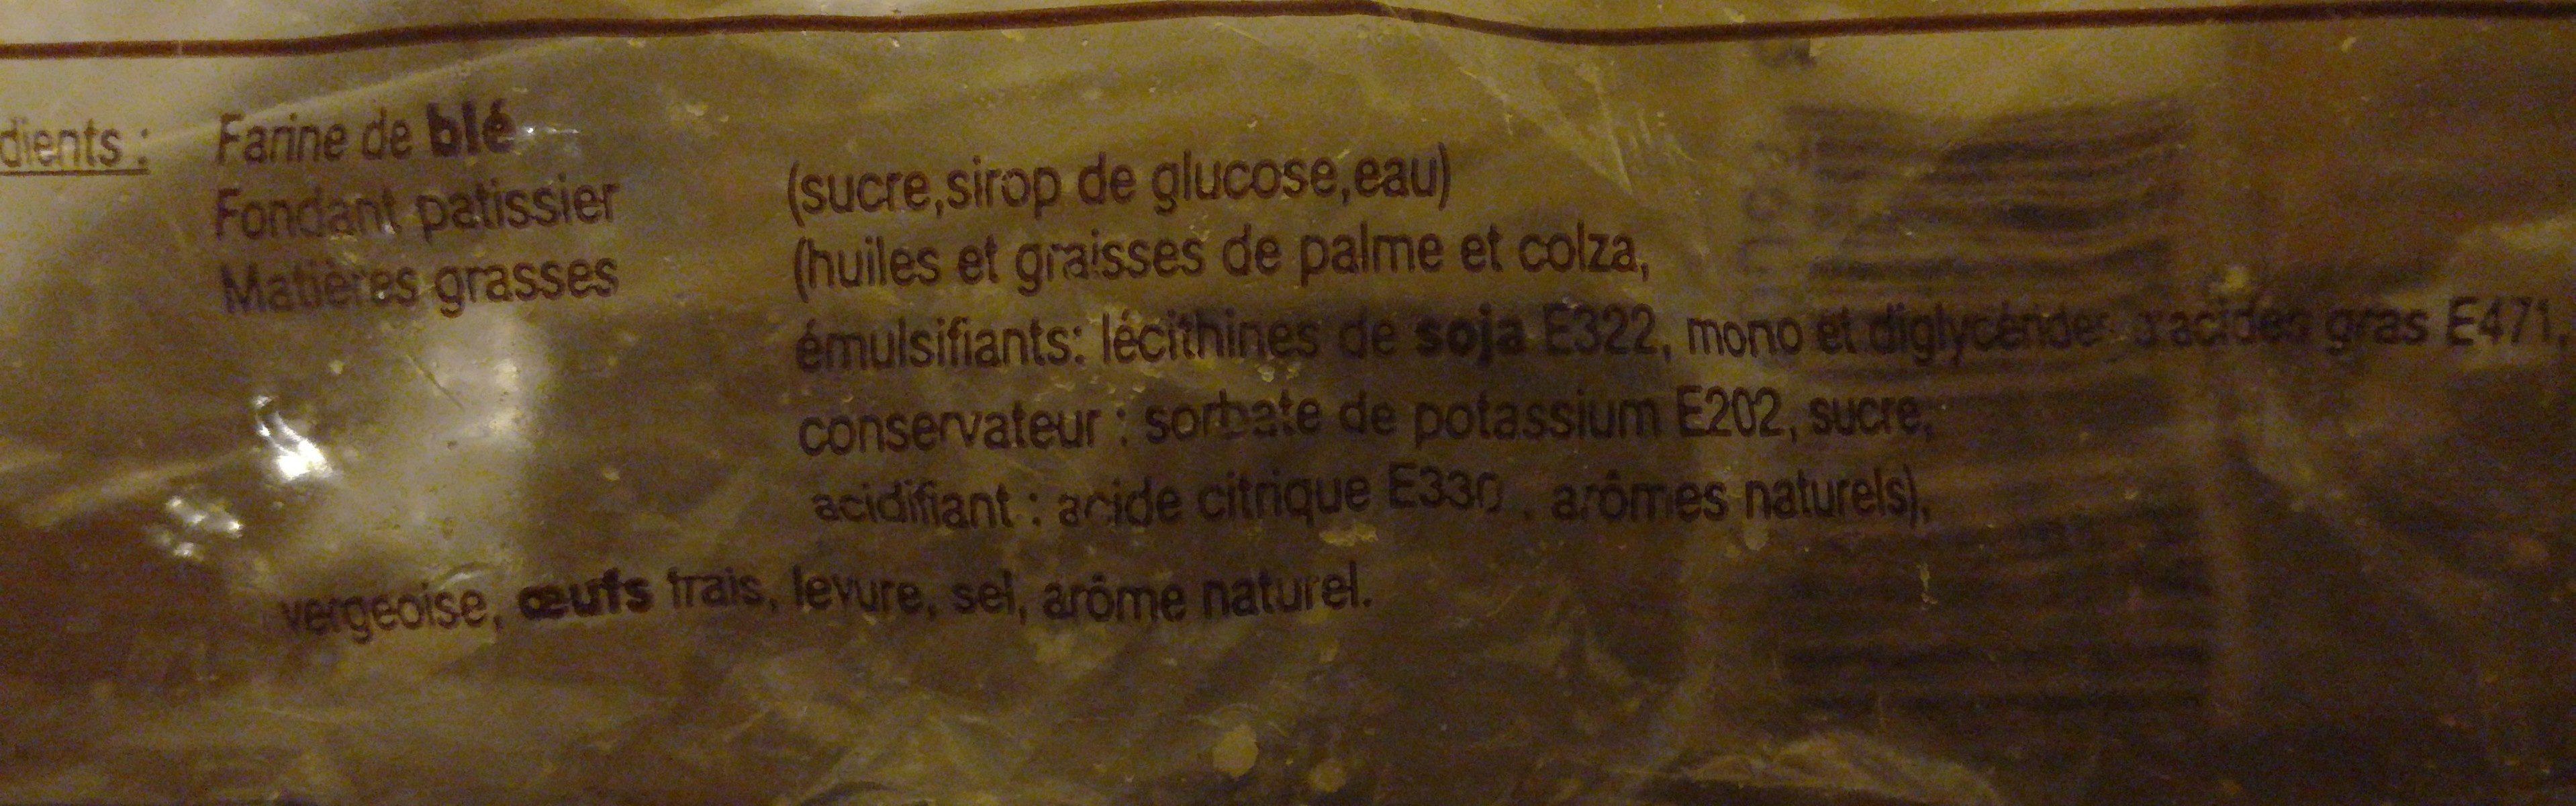 La gaufre du Nord - Ingredients - fr